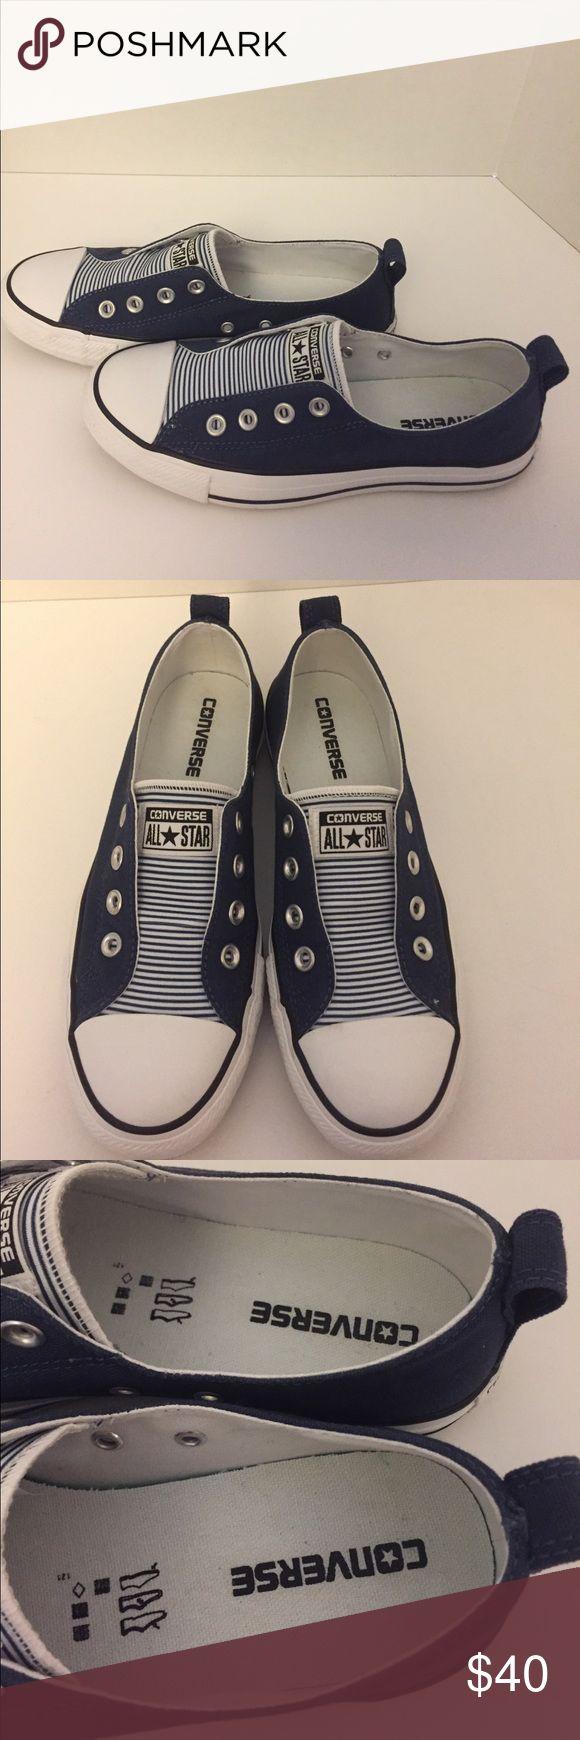 Converse All Stars Nautical Stripe SlipOn Sneakers Gently Worn - Converse All Star Nautical Stripe Slip-On Sneakers Converse Shoes Sneakers